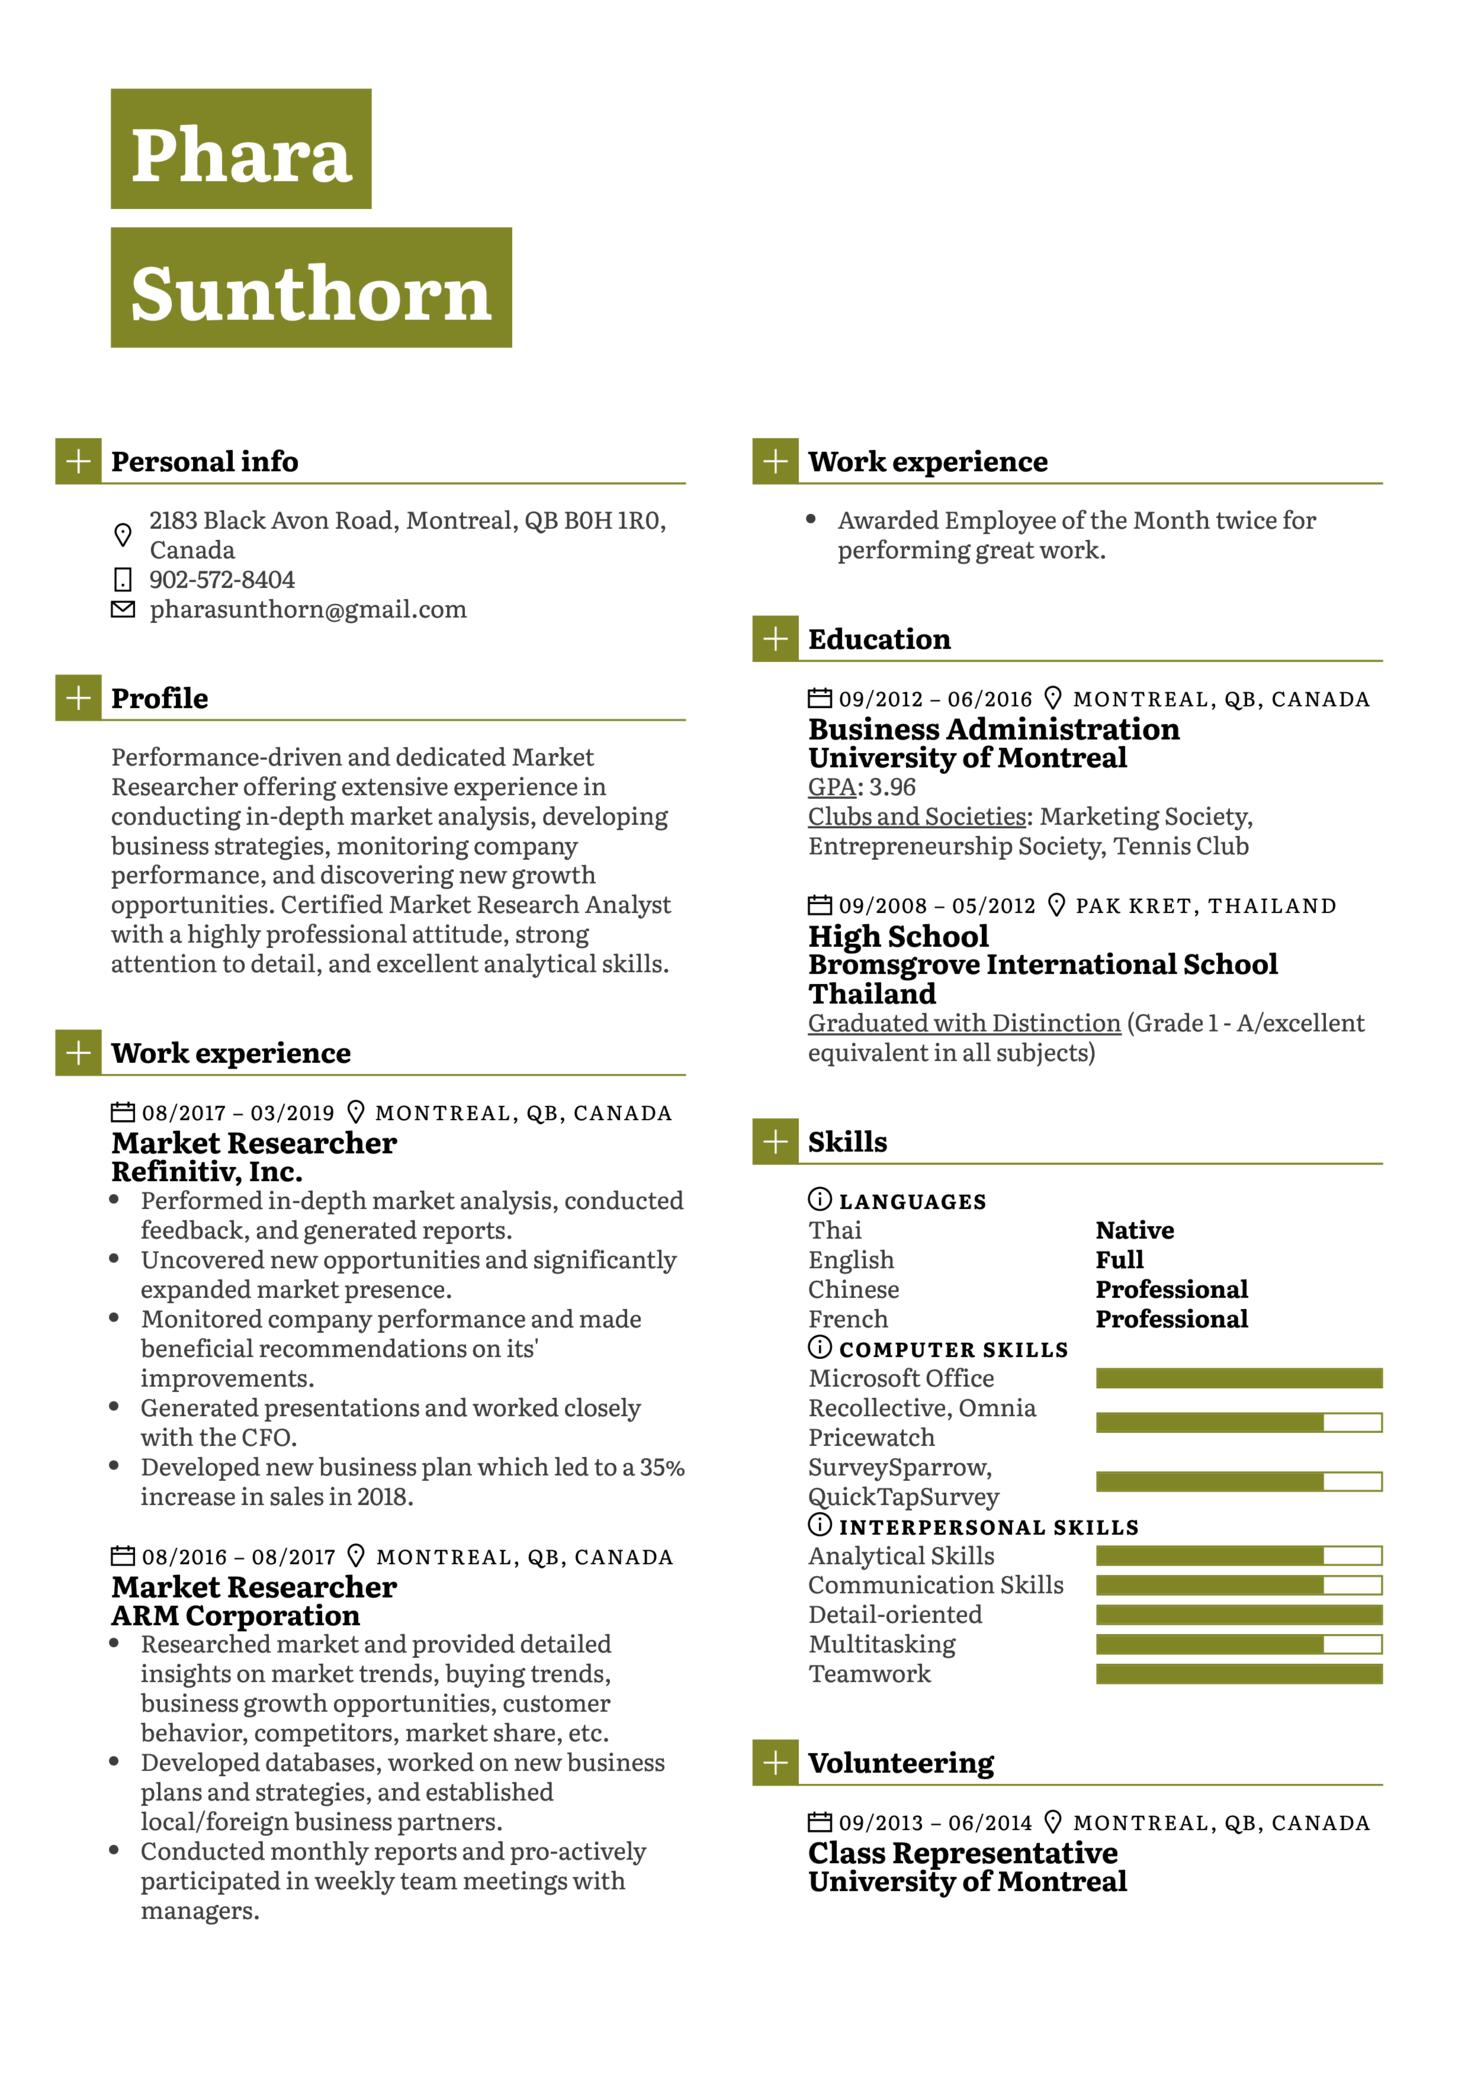 Market Researcher Resume Sample (Part 1)